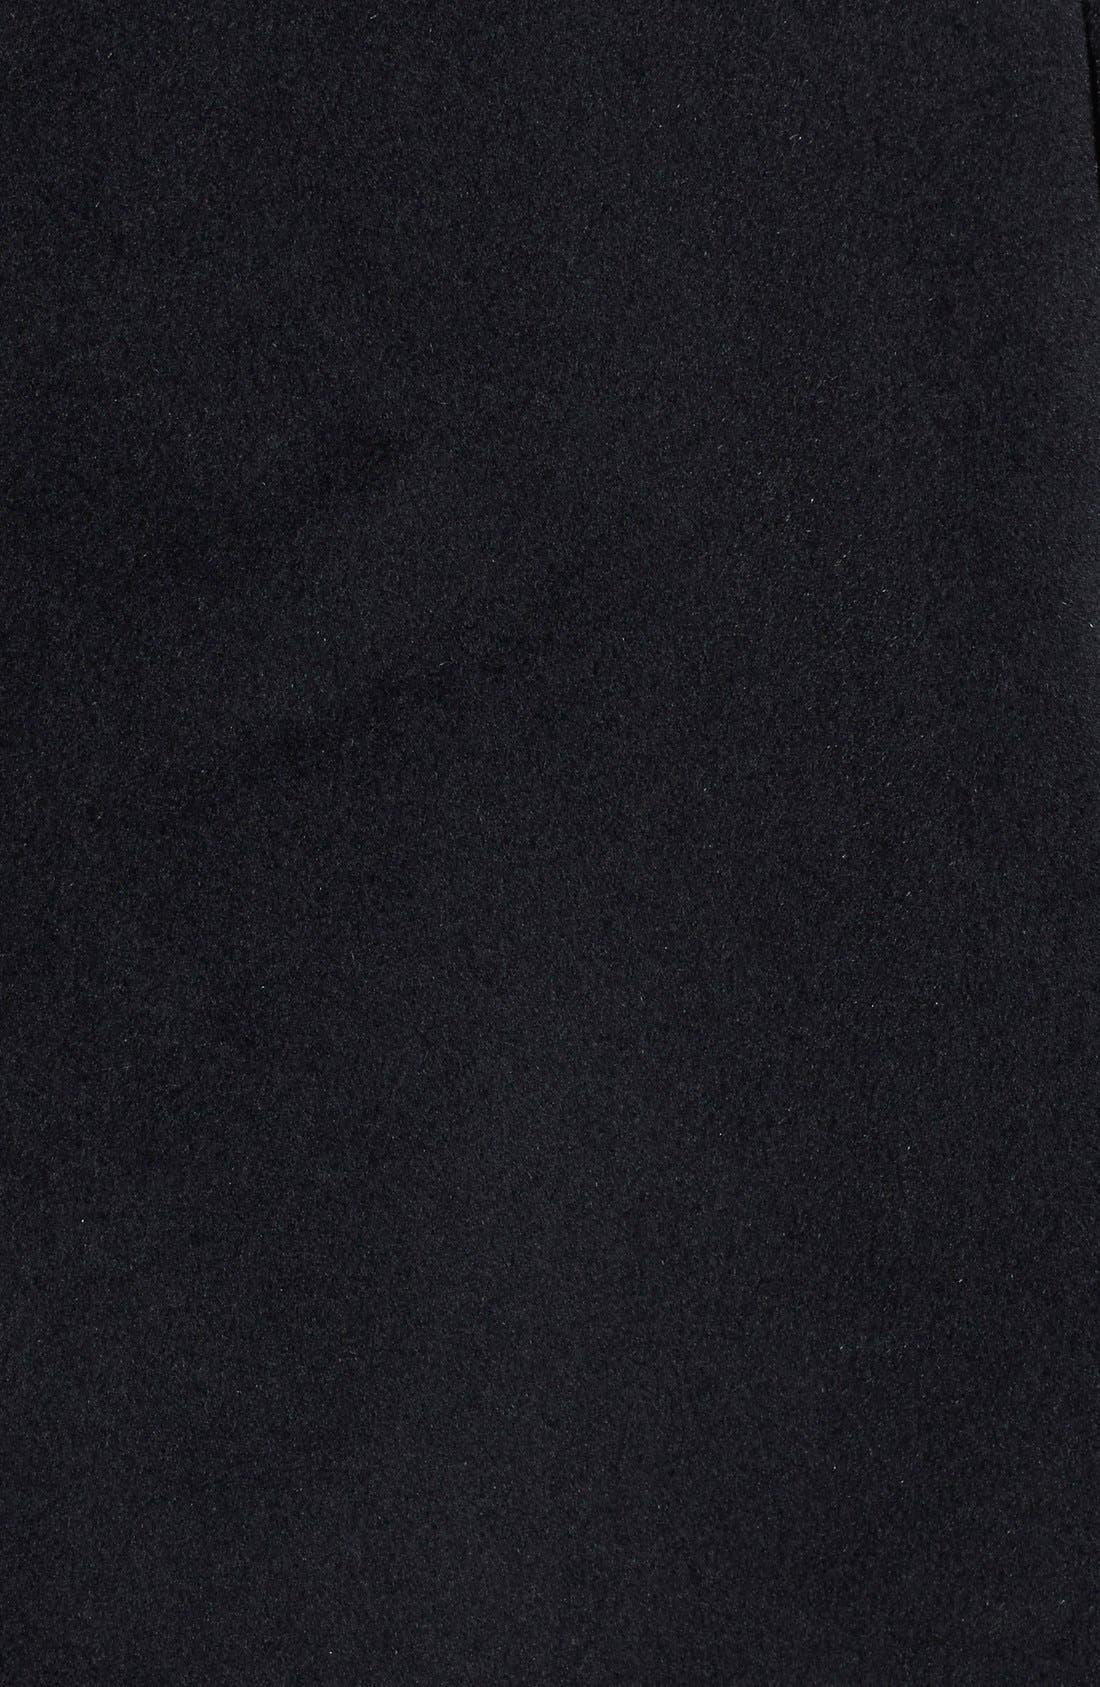 BETSEY JOHNSON,                             'Toggle' Flyaway Wool & Angora Blend Coat,                             Alternate thumbnail 3, color,                             001